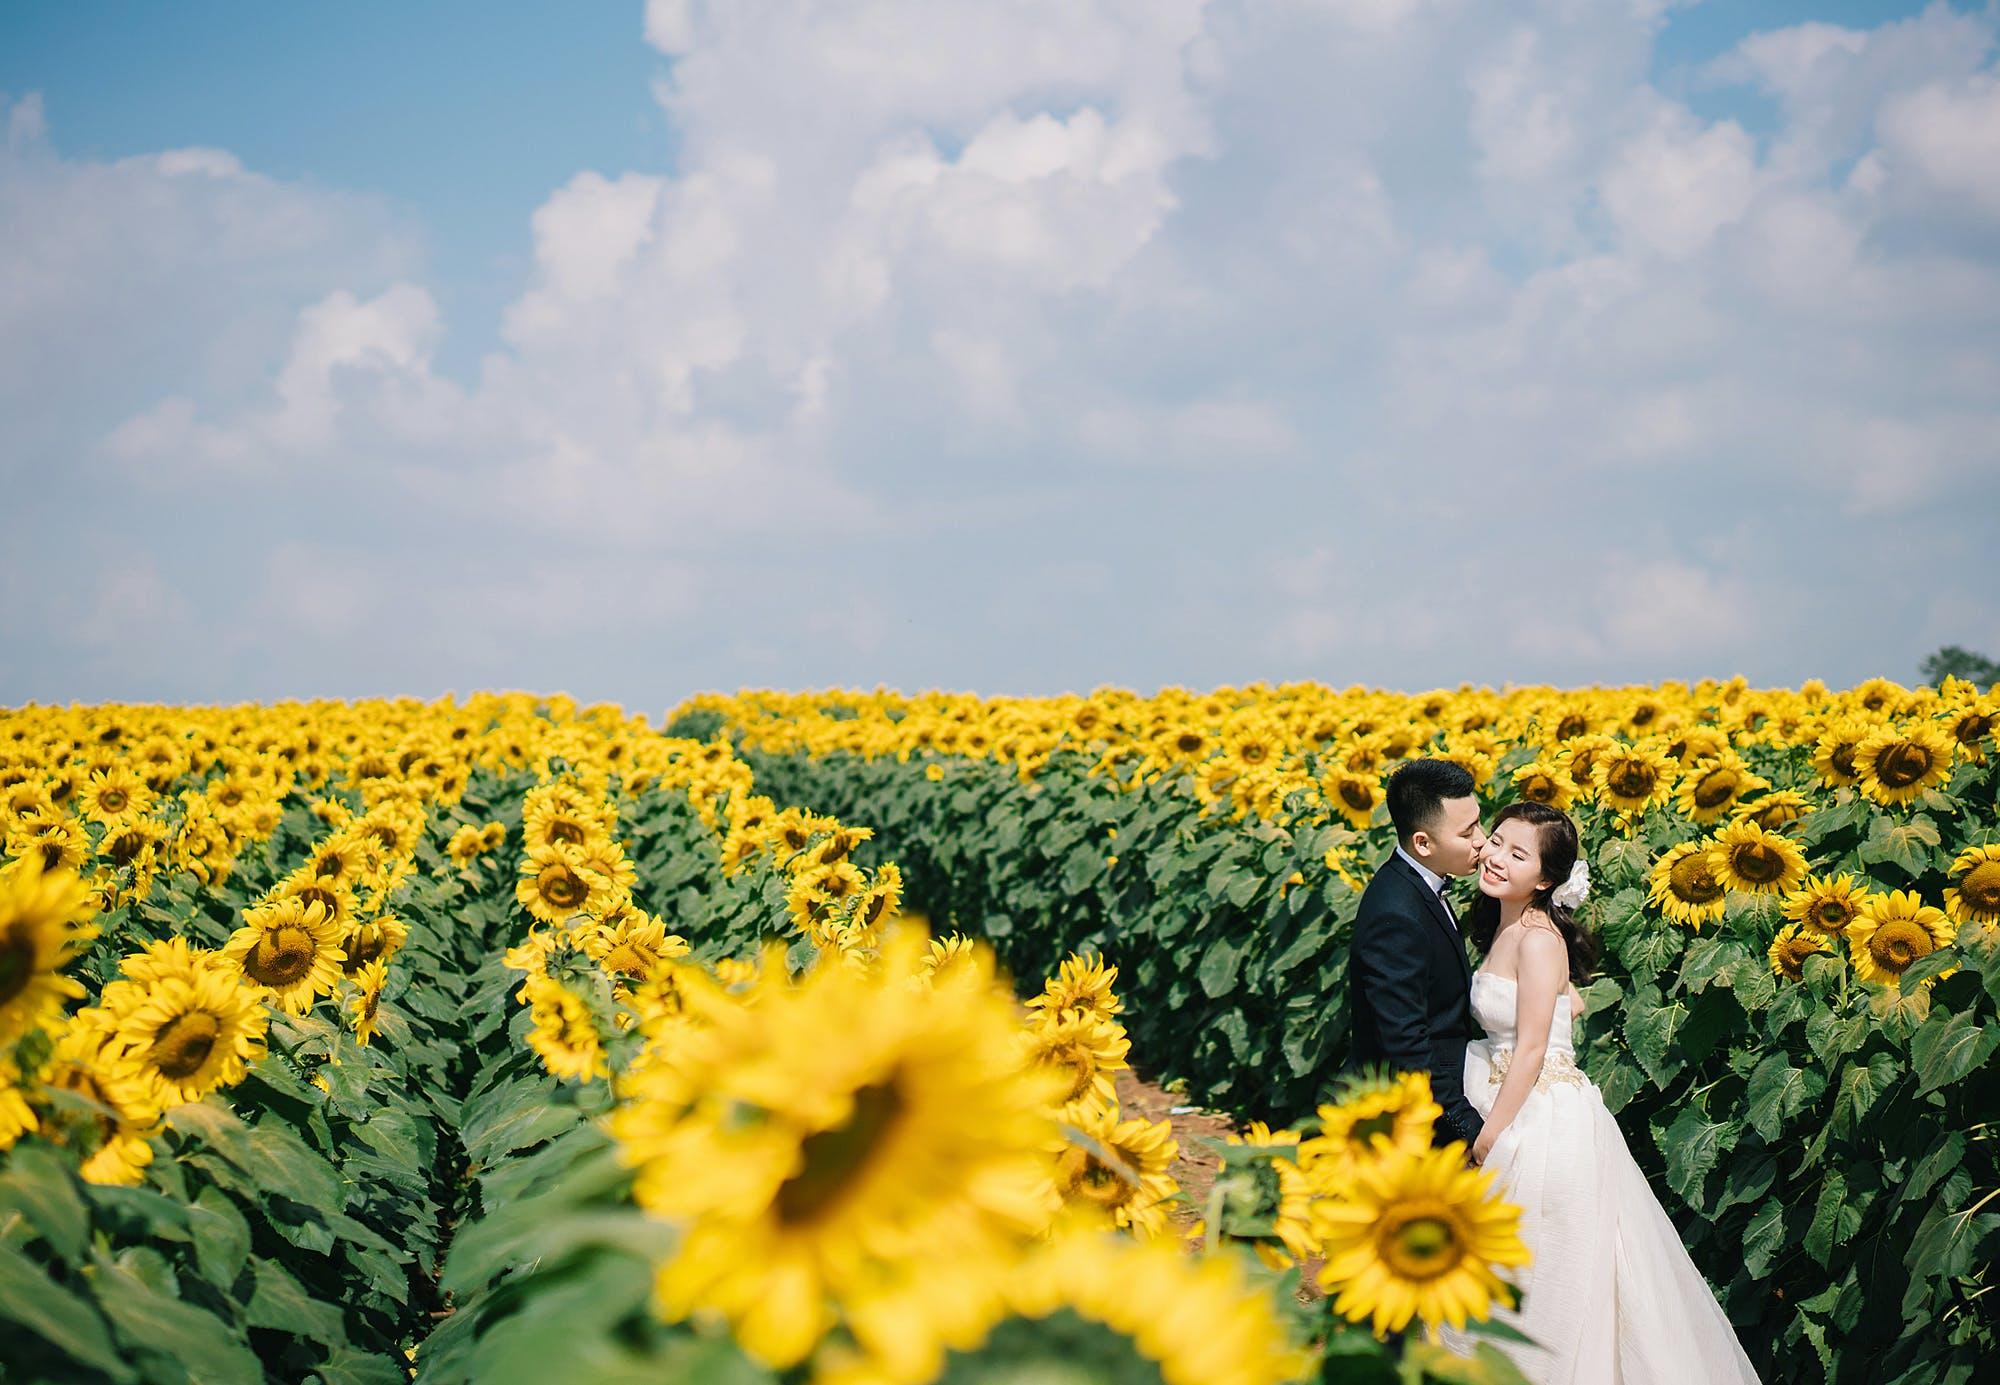 beautiful flowers, blue sky, Bride and Groom